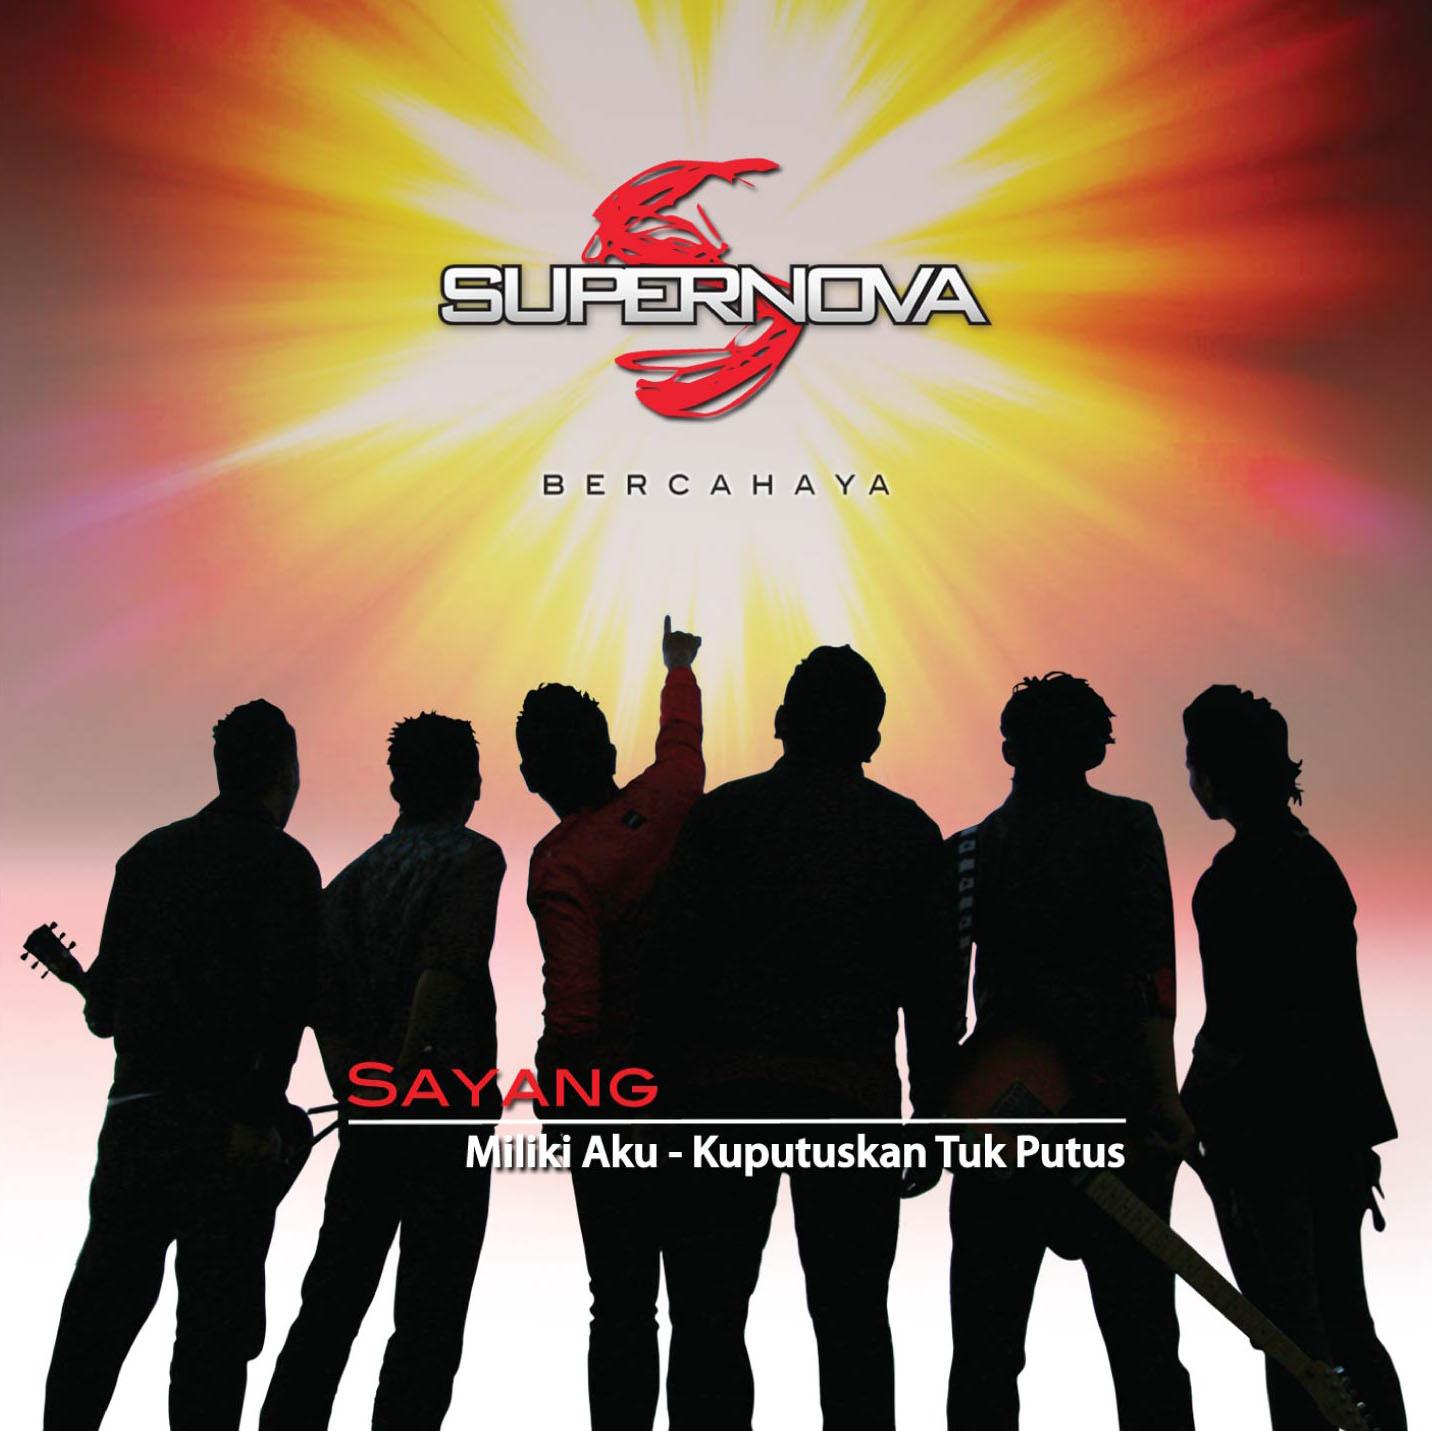 Supernova - Bercahaya